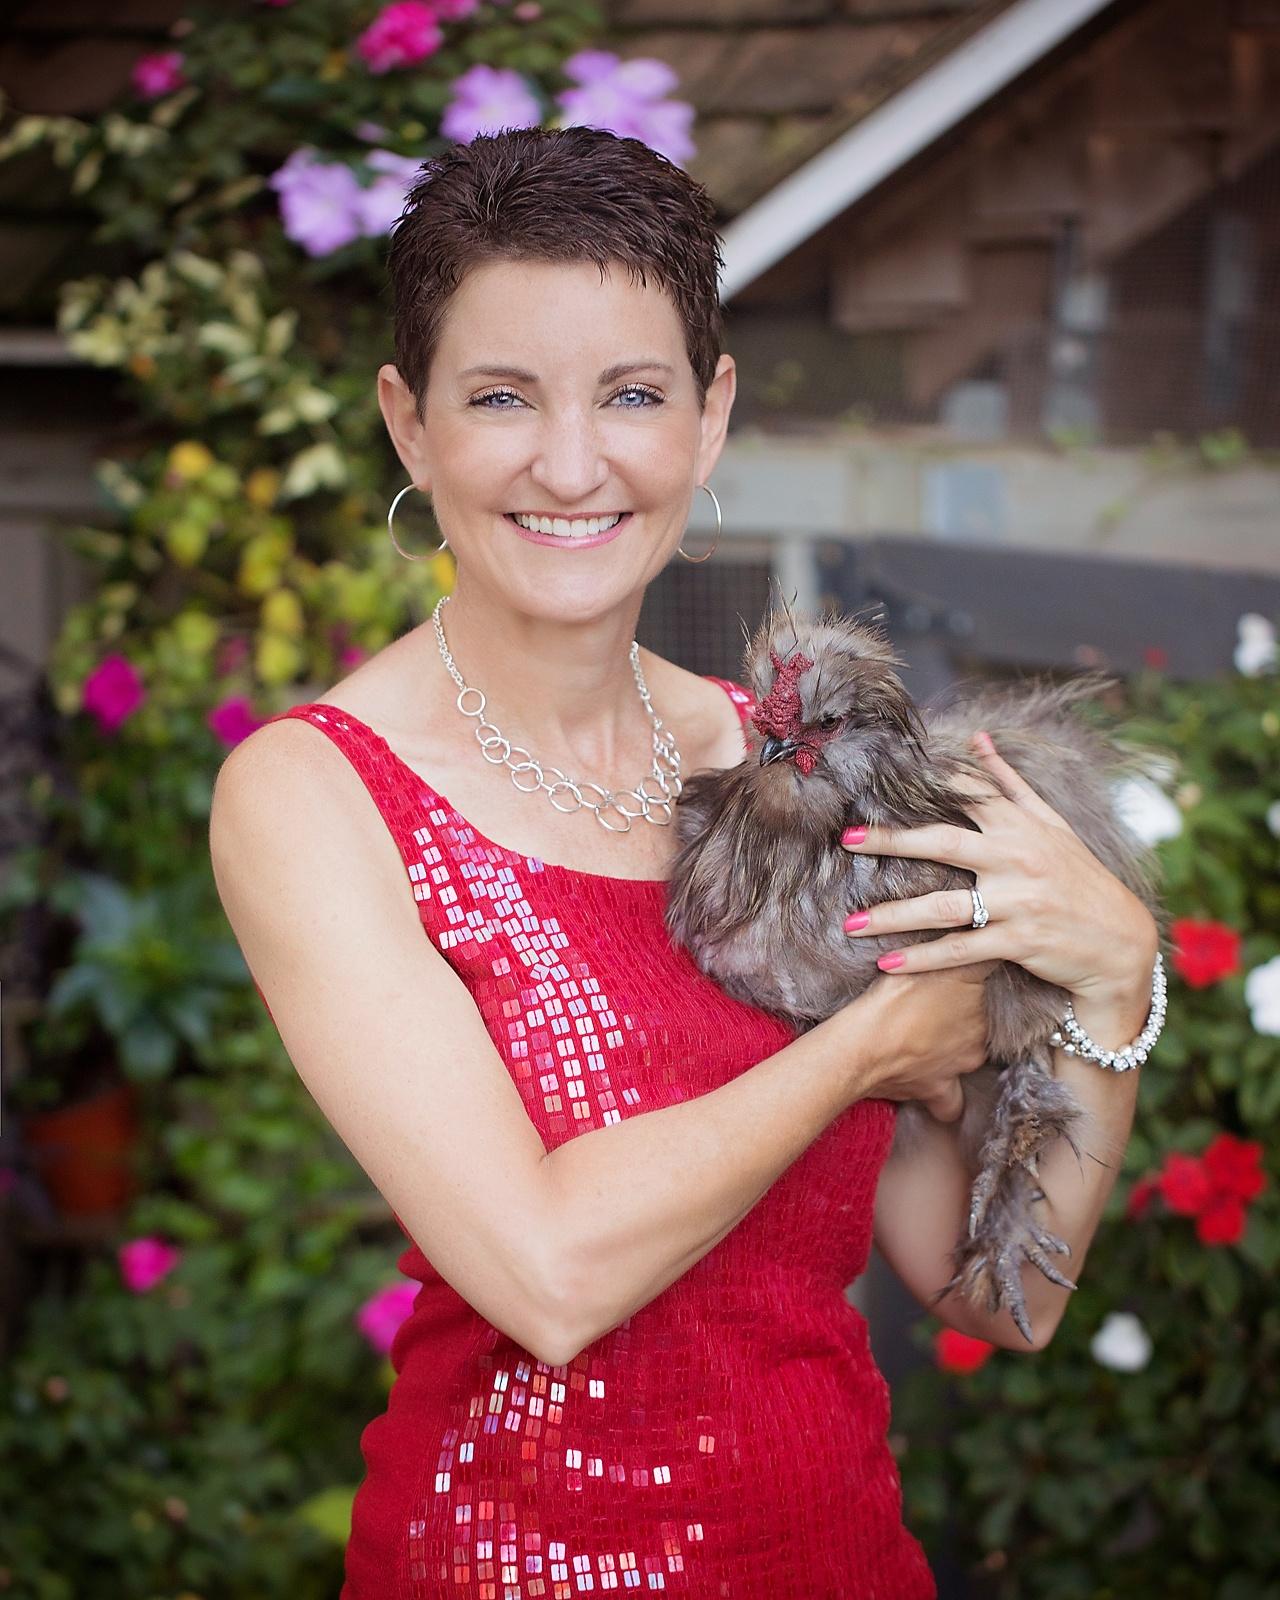 Kathy Shea Mormino - The Chicken Chick